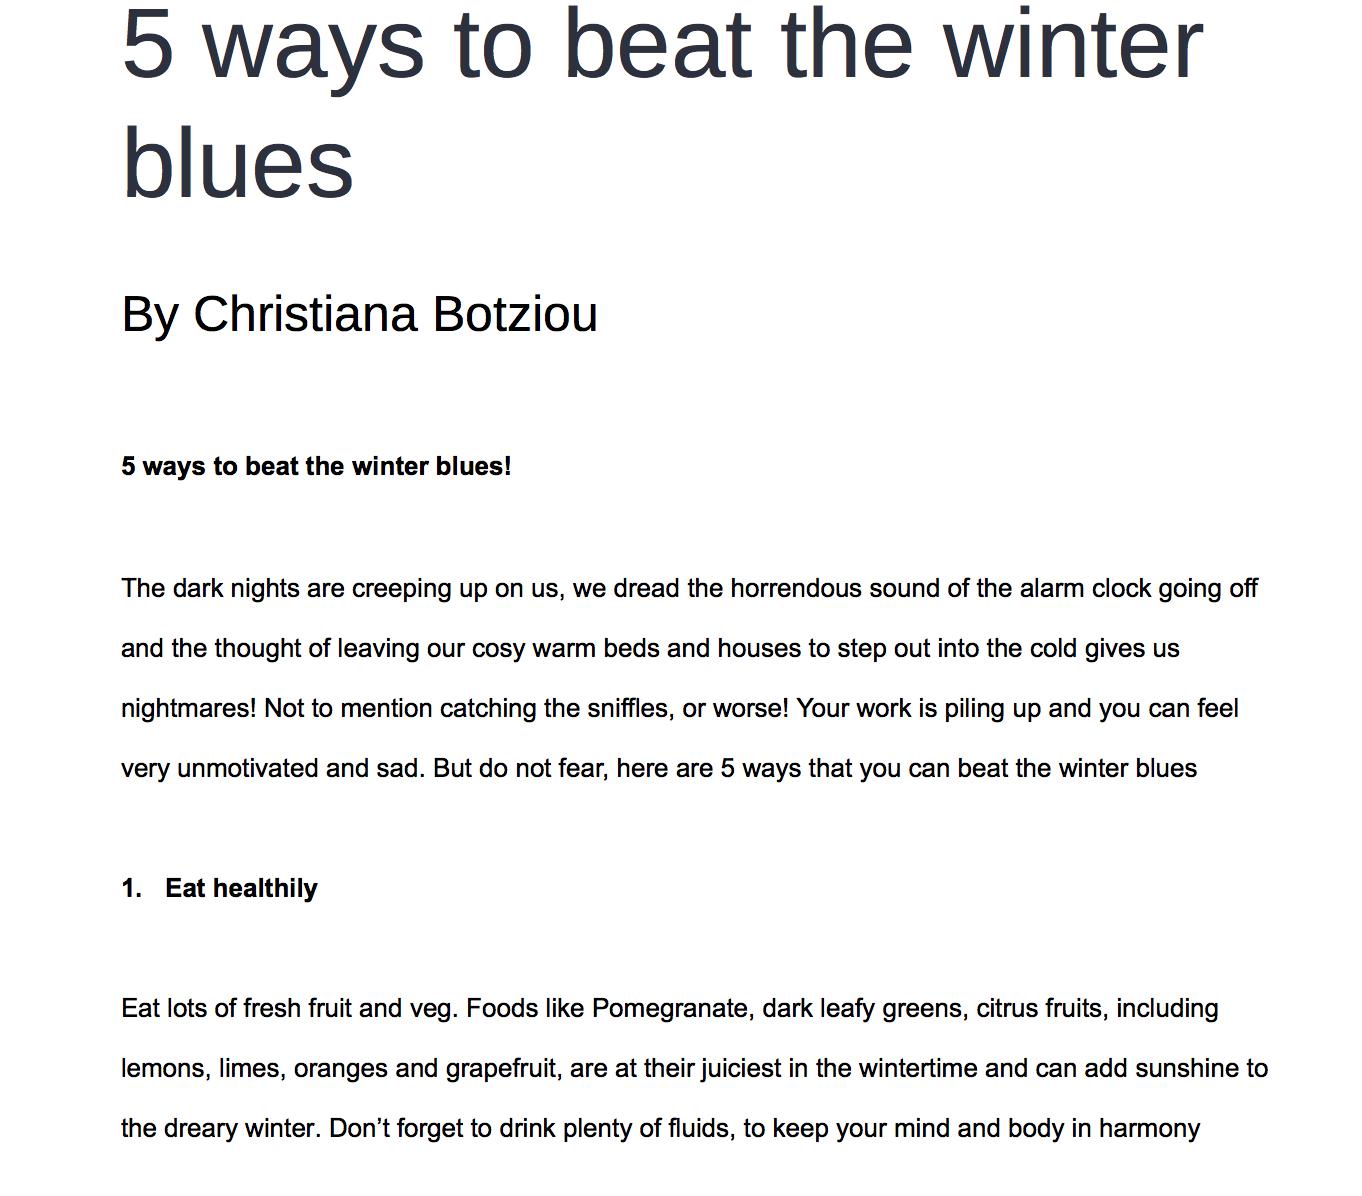 brain fud 5 ways to beat the winter blues